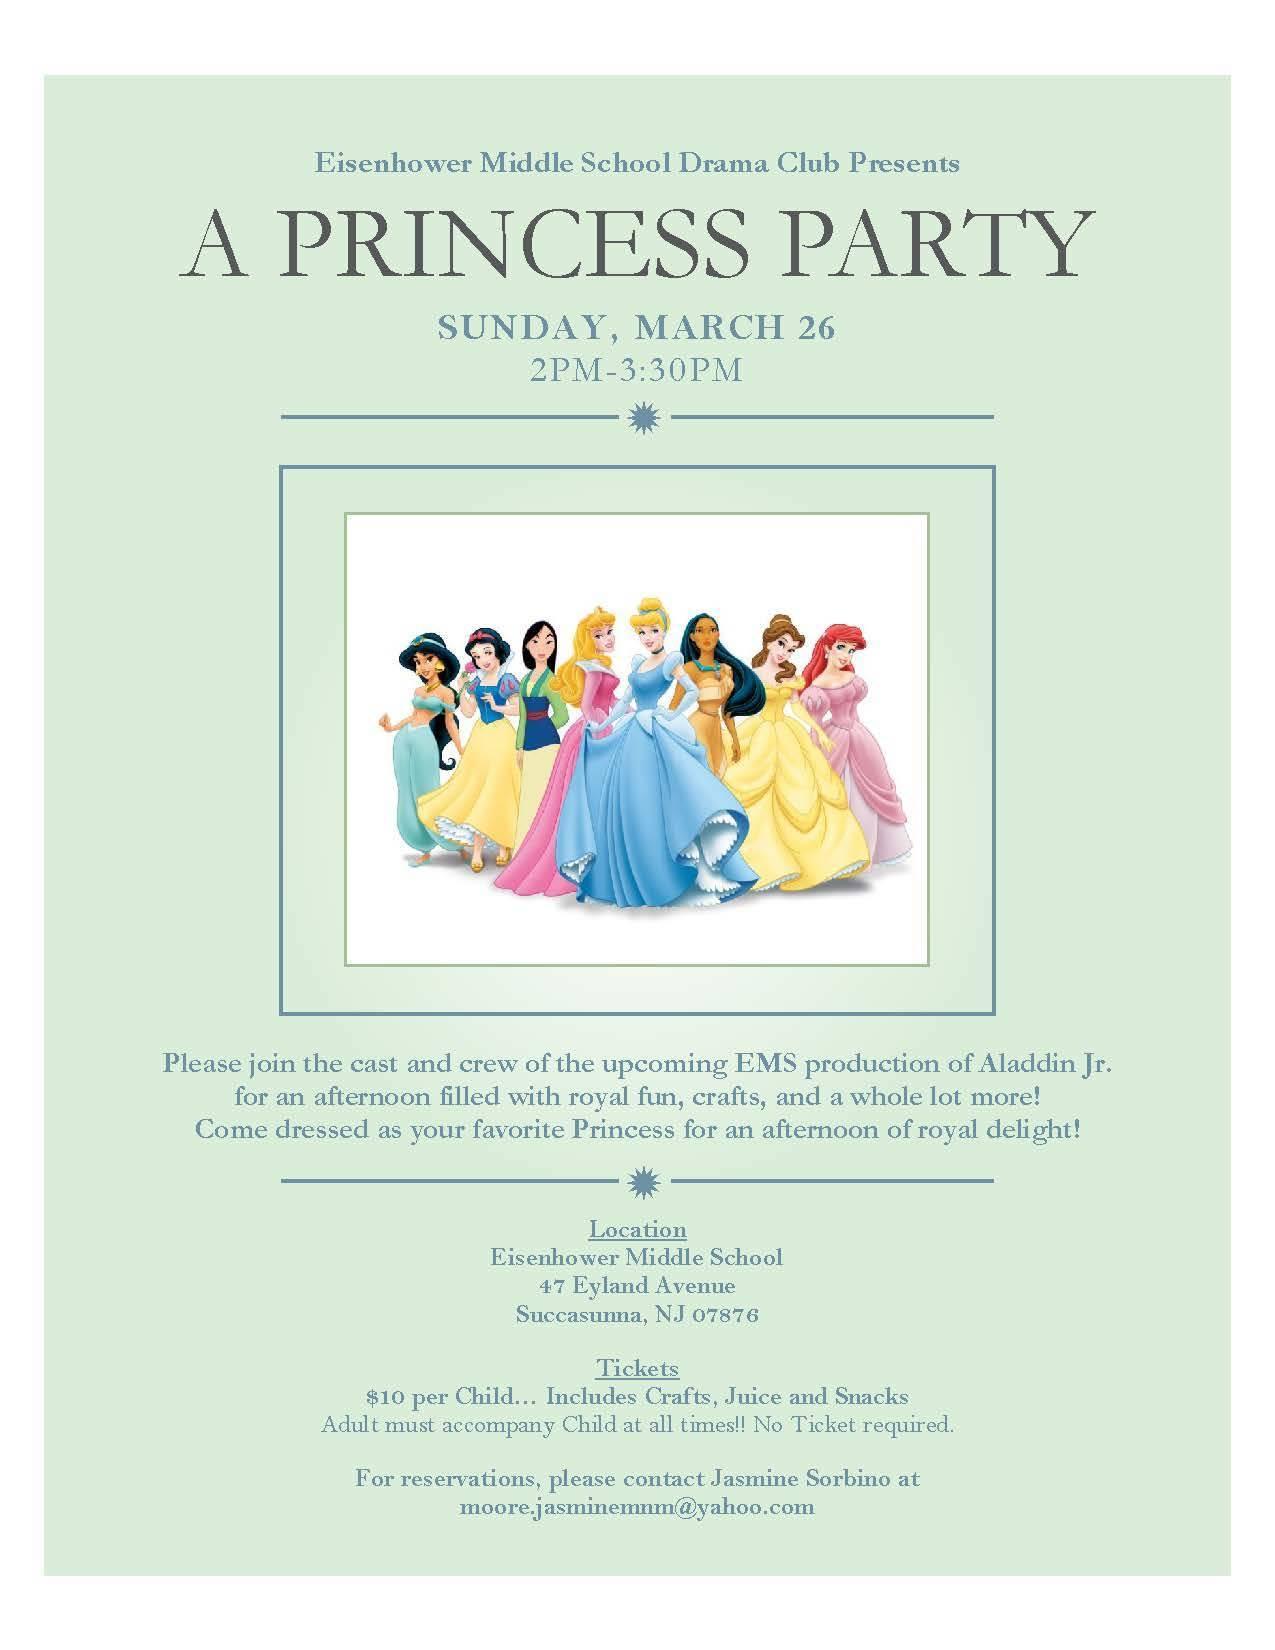 0d40ed98e894344f4049_EMS_Princess_Tea_Party_Flyer_2017.jpg